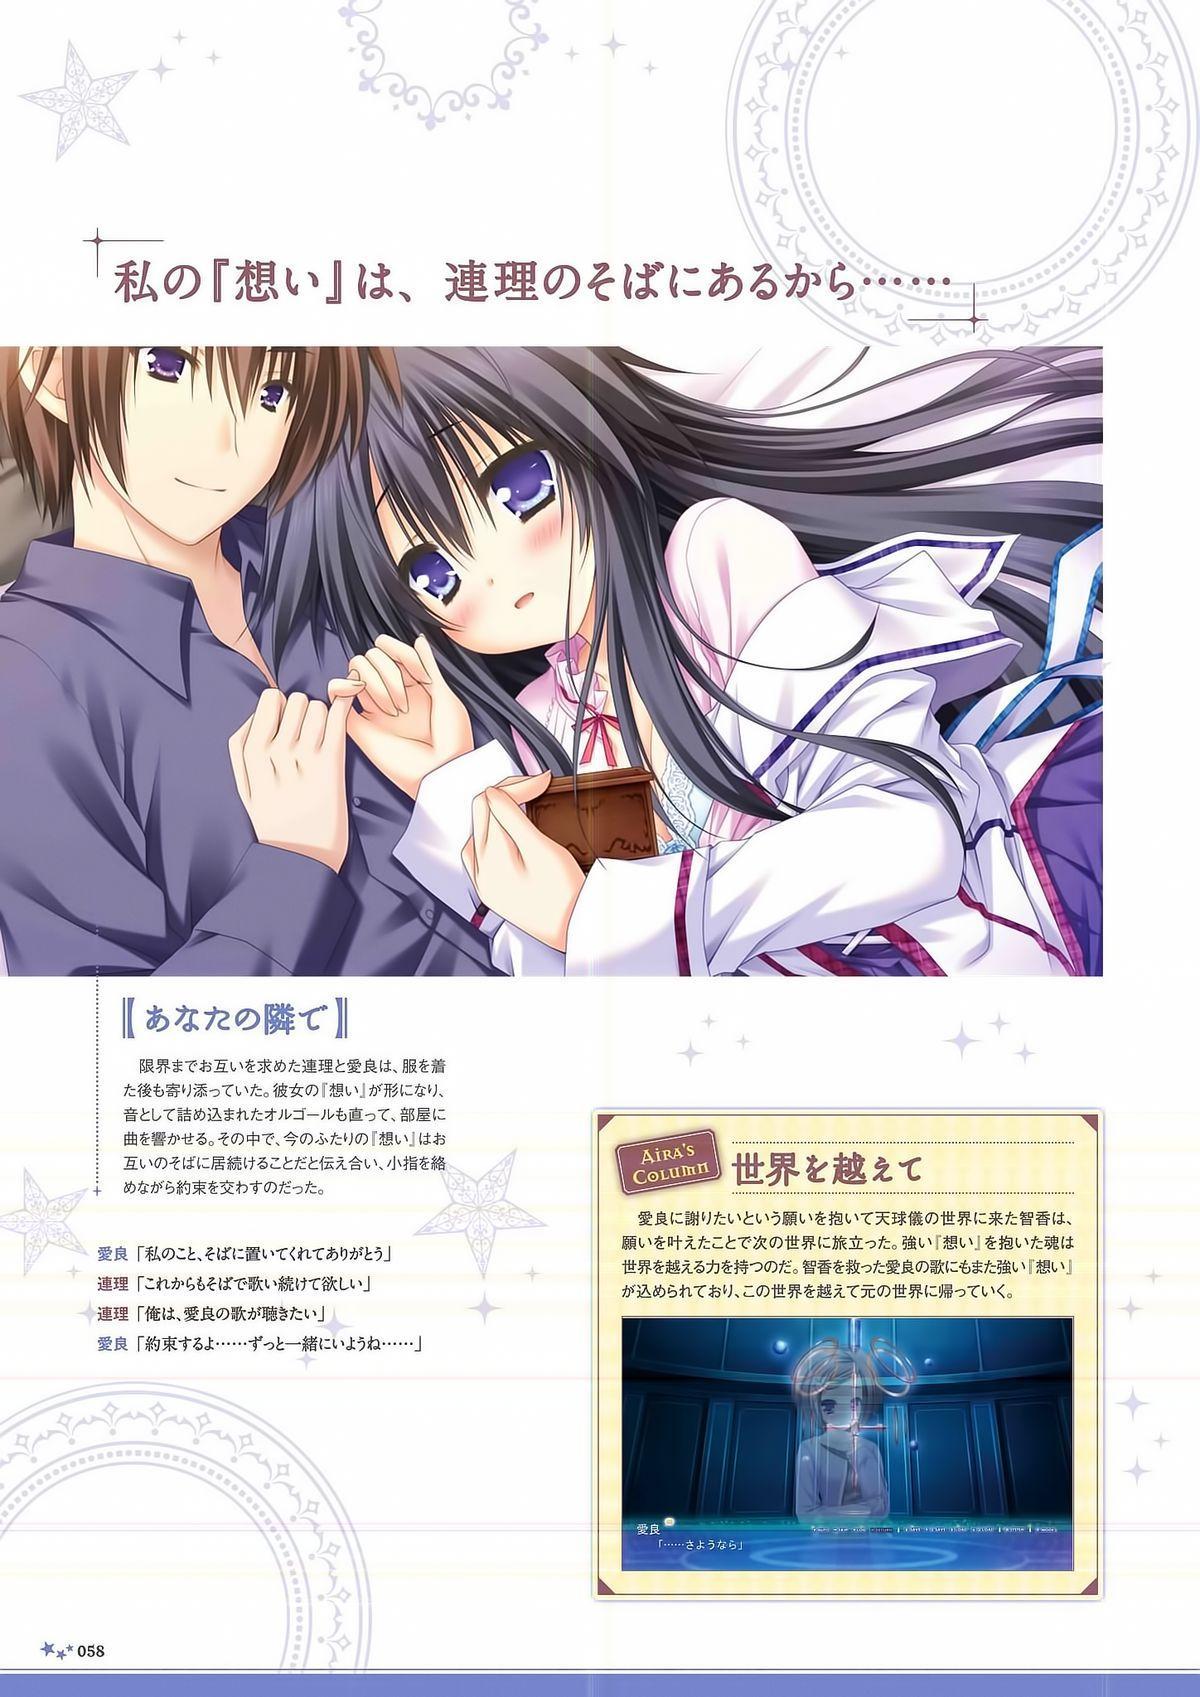 Sekai to Sekai no Mannaka de Visual Fanbook 59